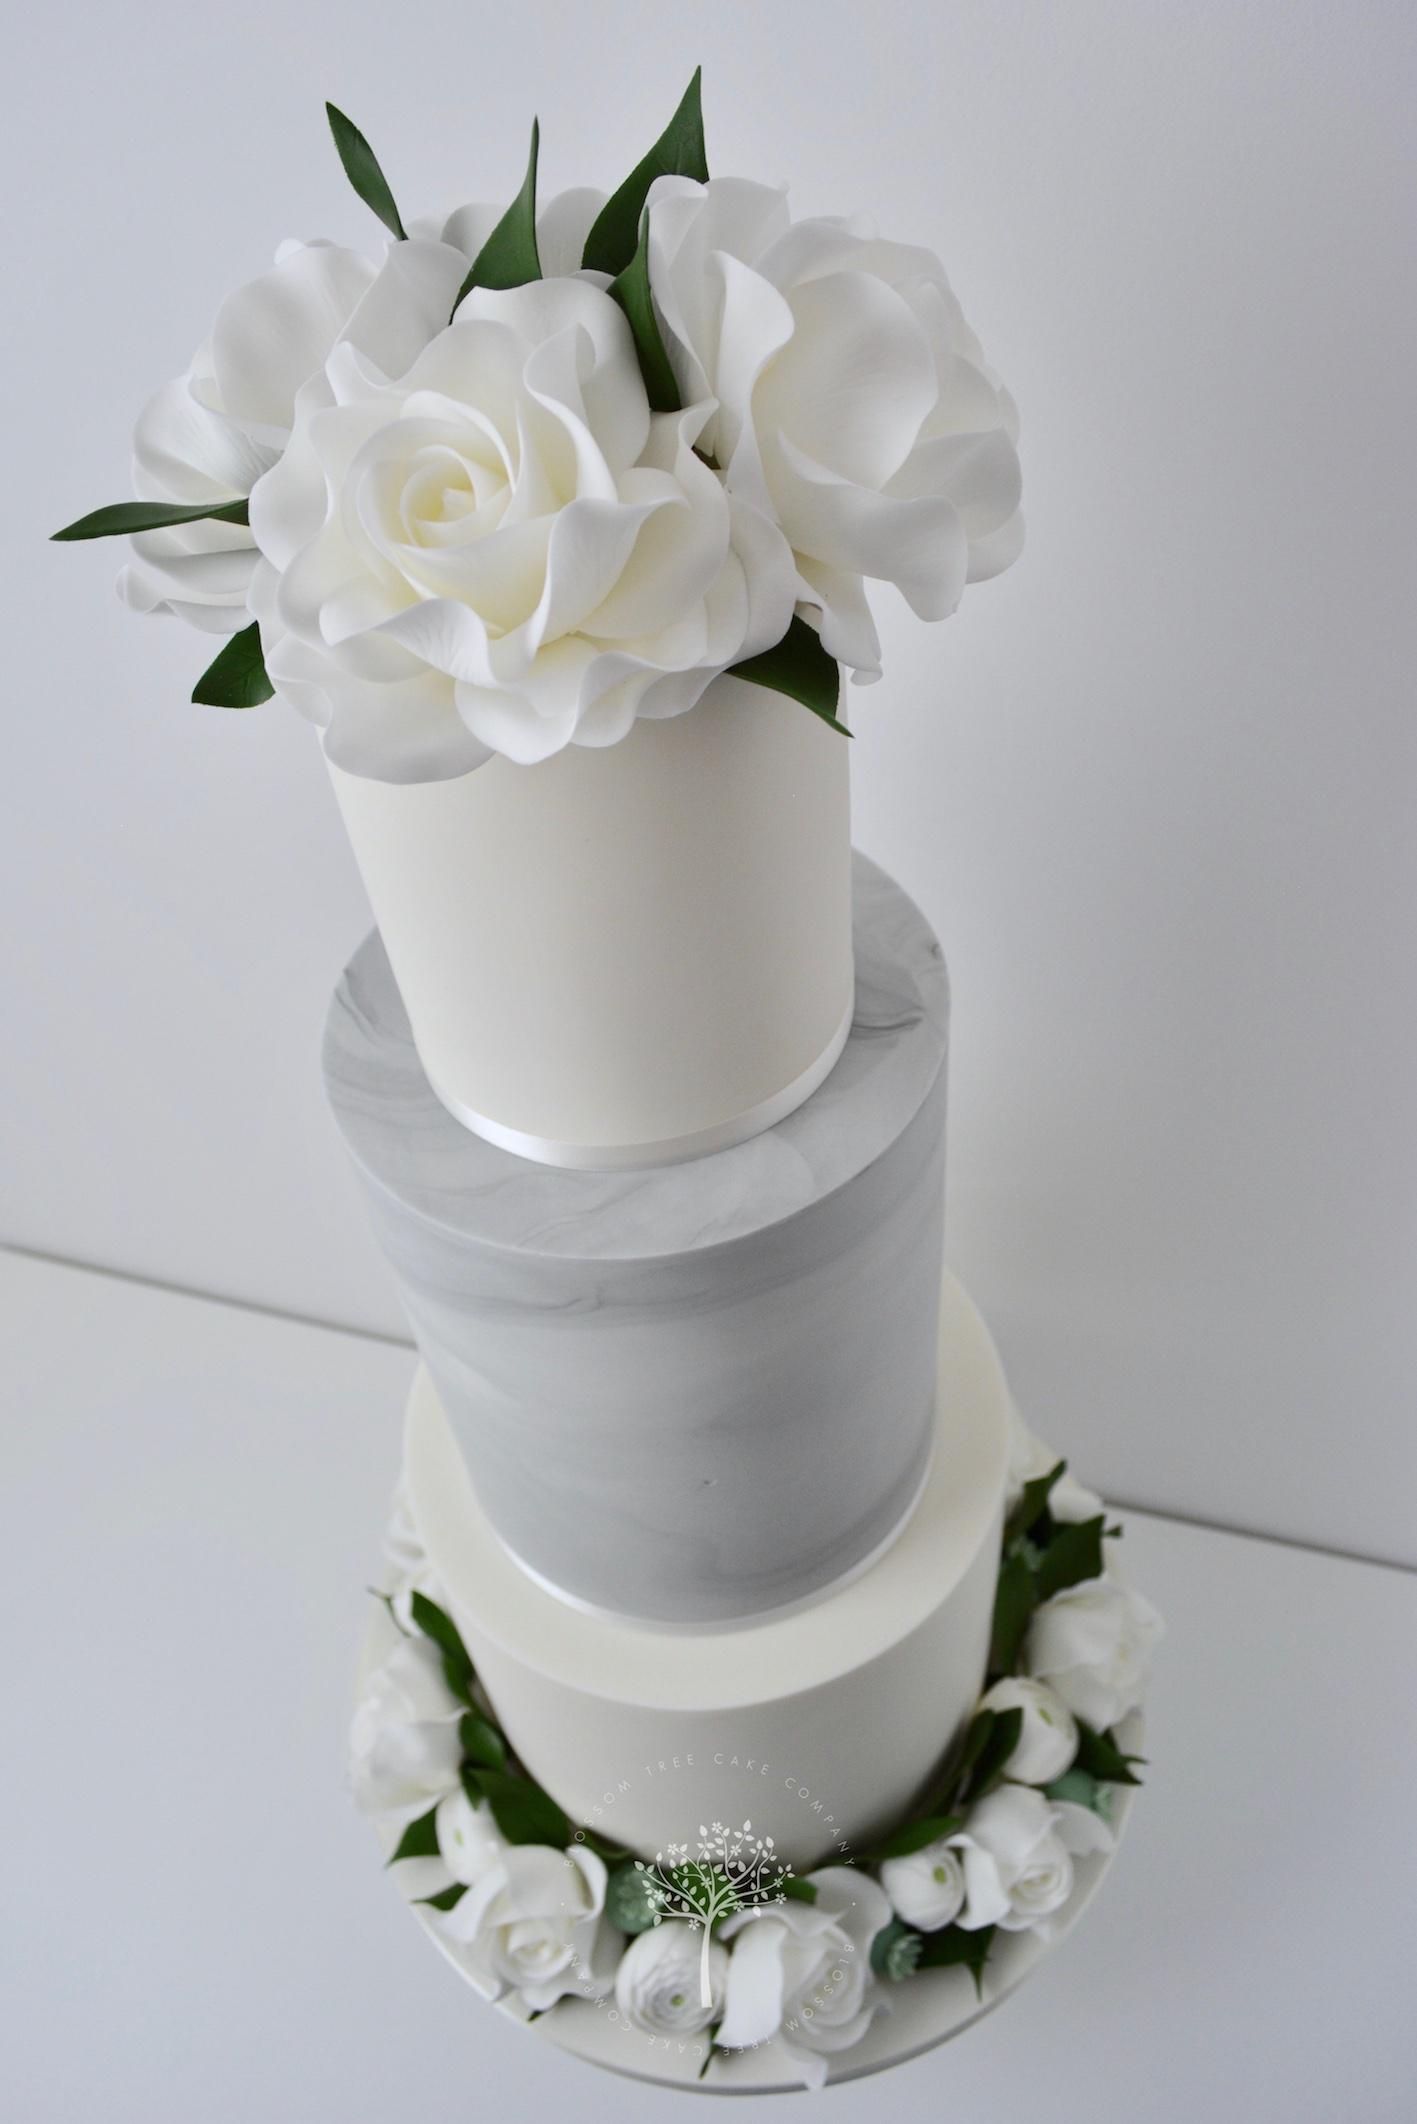 White Roses and Ranunculus wedding cake by Blossom Tree Cake Company Harrogate North Yorkshire - angle.jpg